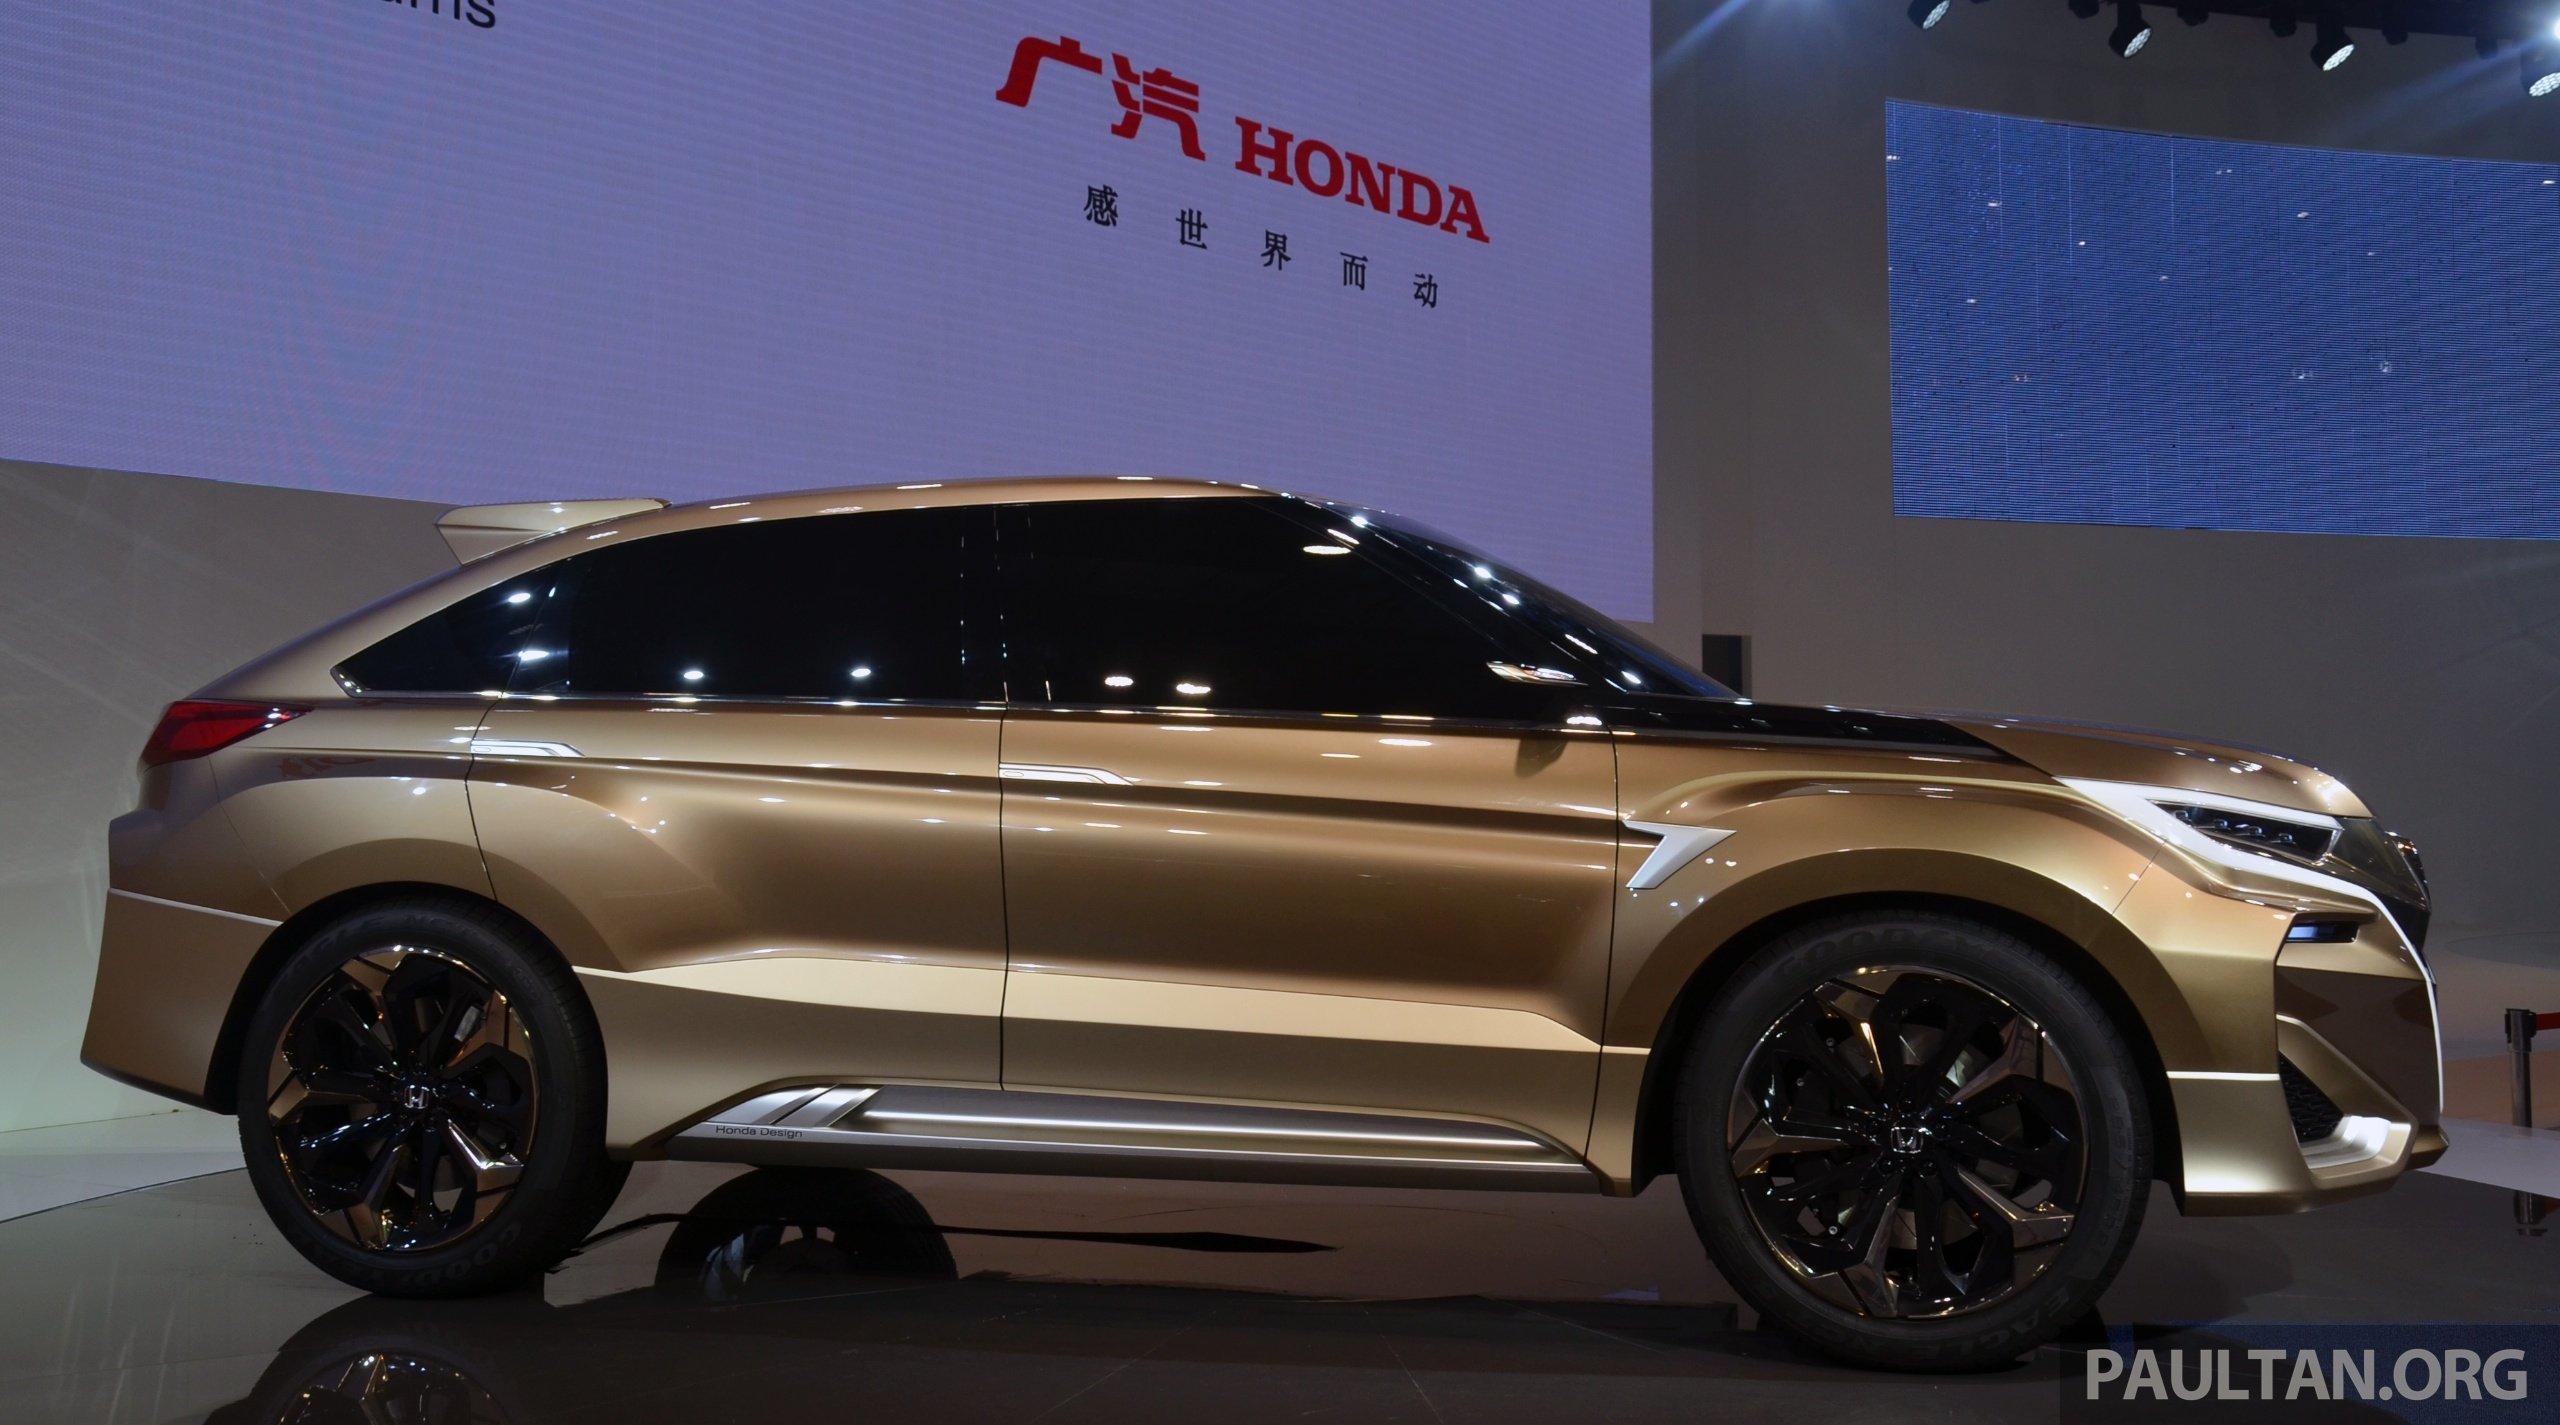 Shanghai 2015: Honda Concept D previews new SUV Image 330316